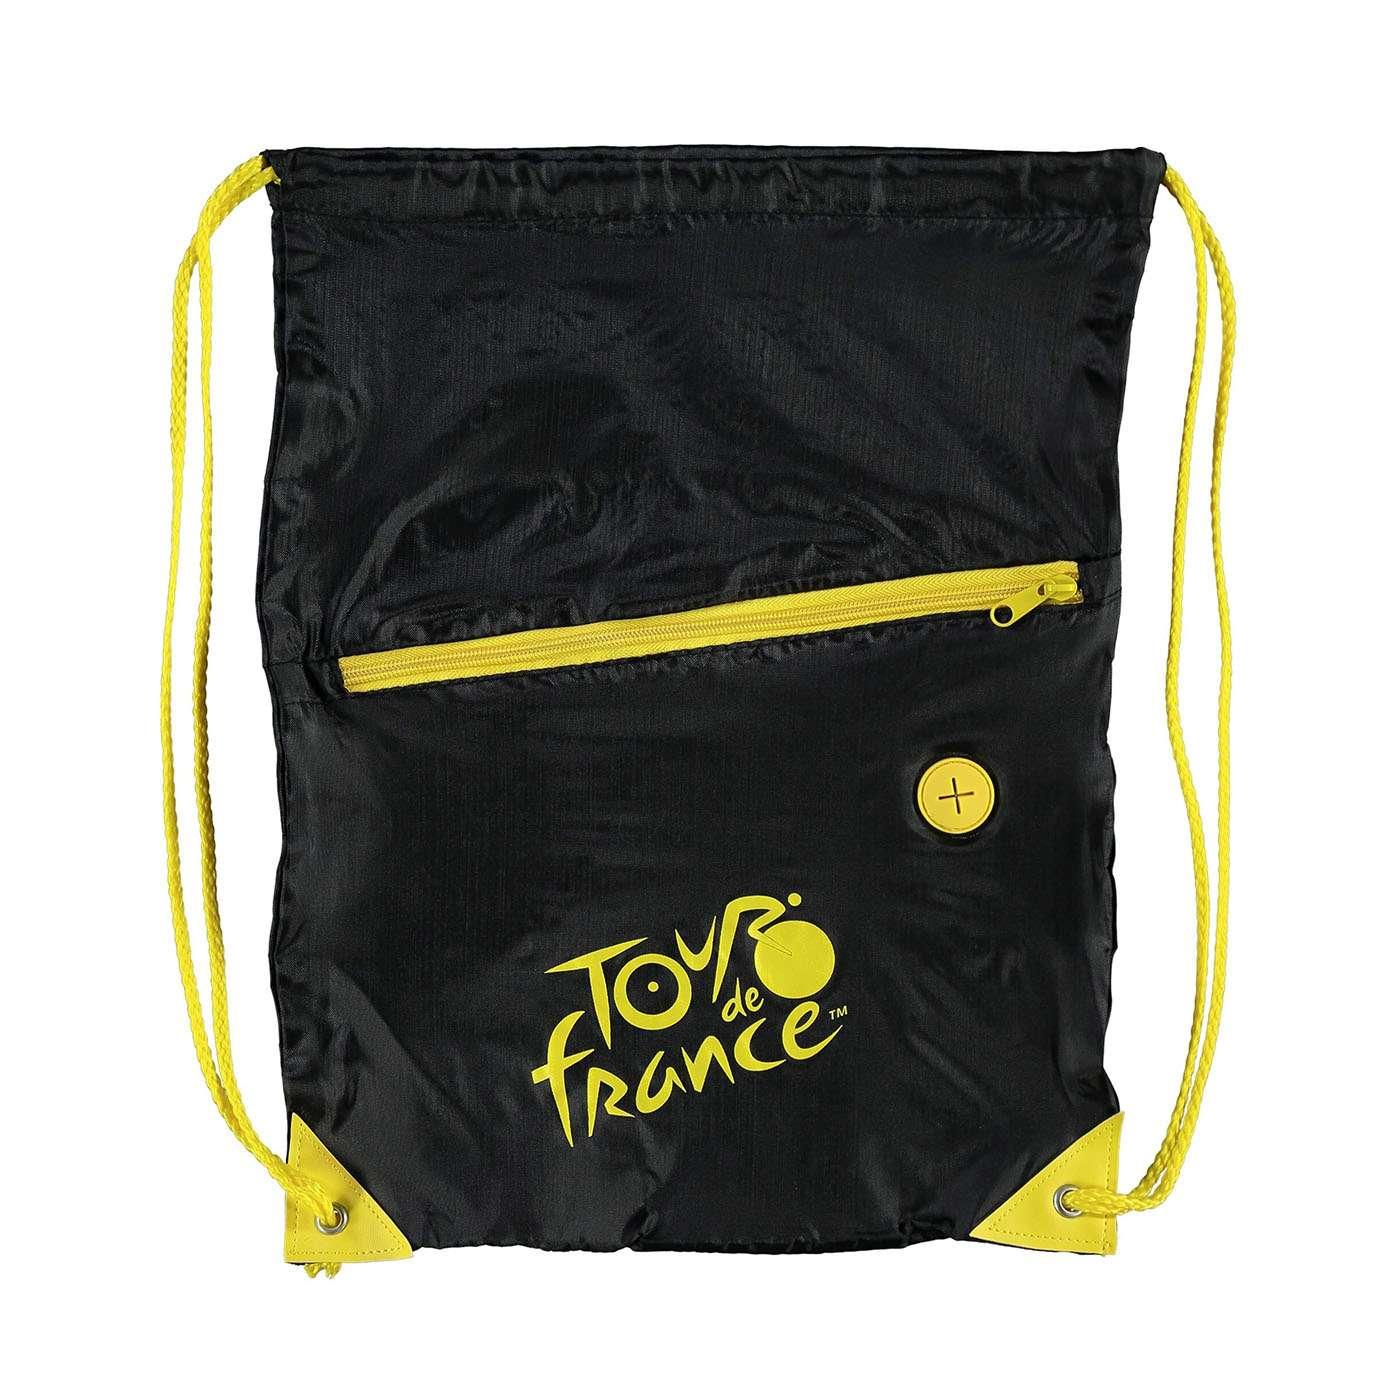 Bag: Cycling - Tour de France Color Pop Drawstring Backpack Photo